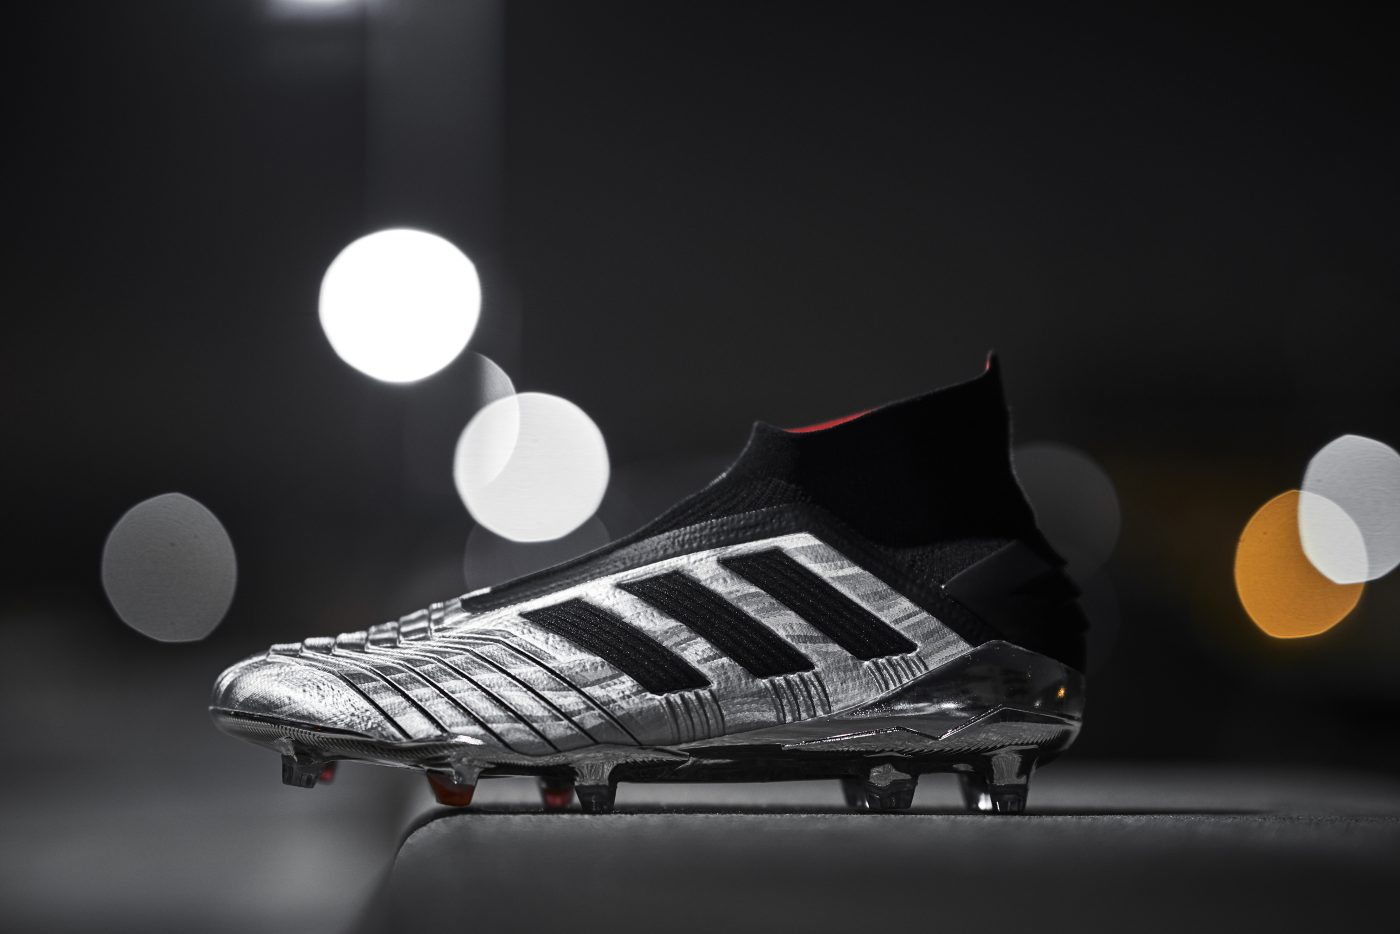 adidas-predator-19-302-redirect-mai-2019-4